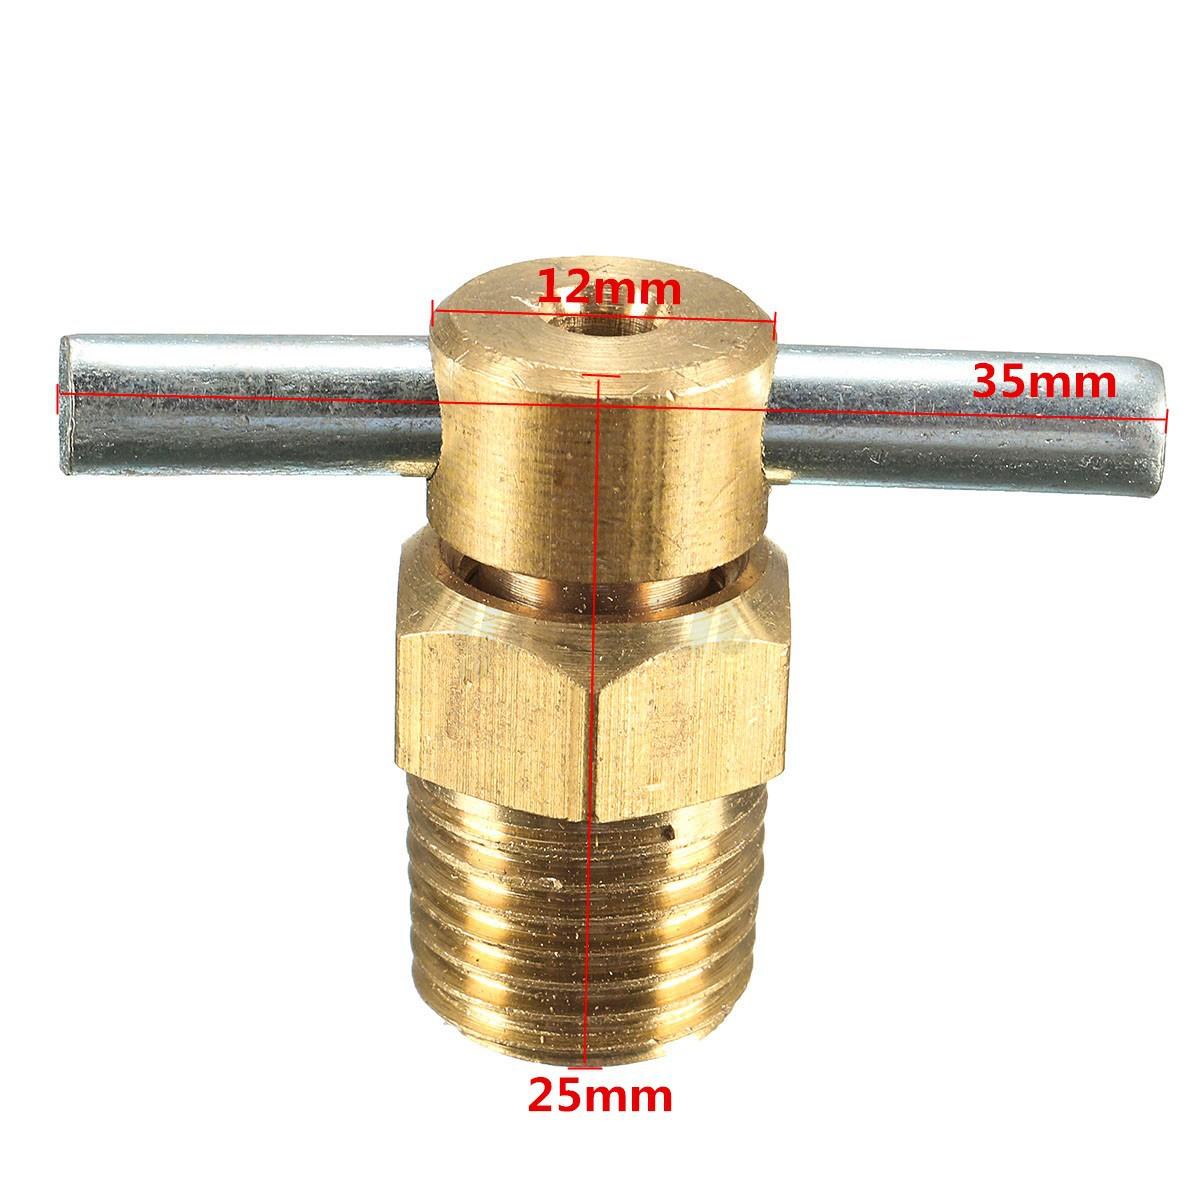 Npt petcock water drain valve for air compressor